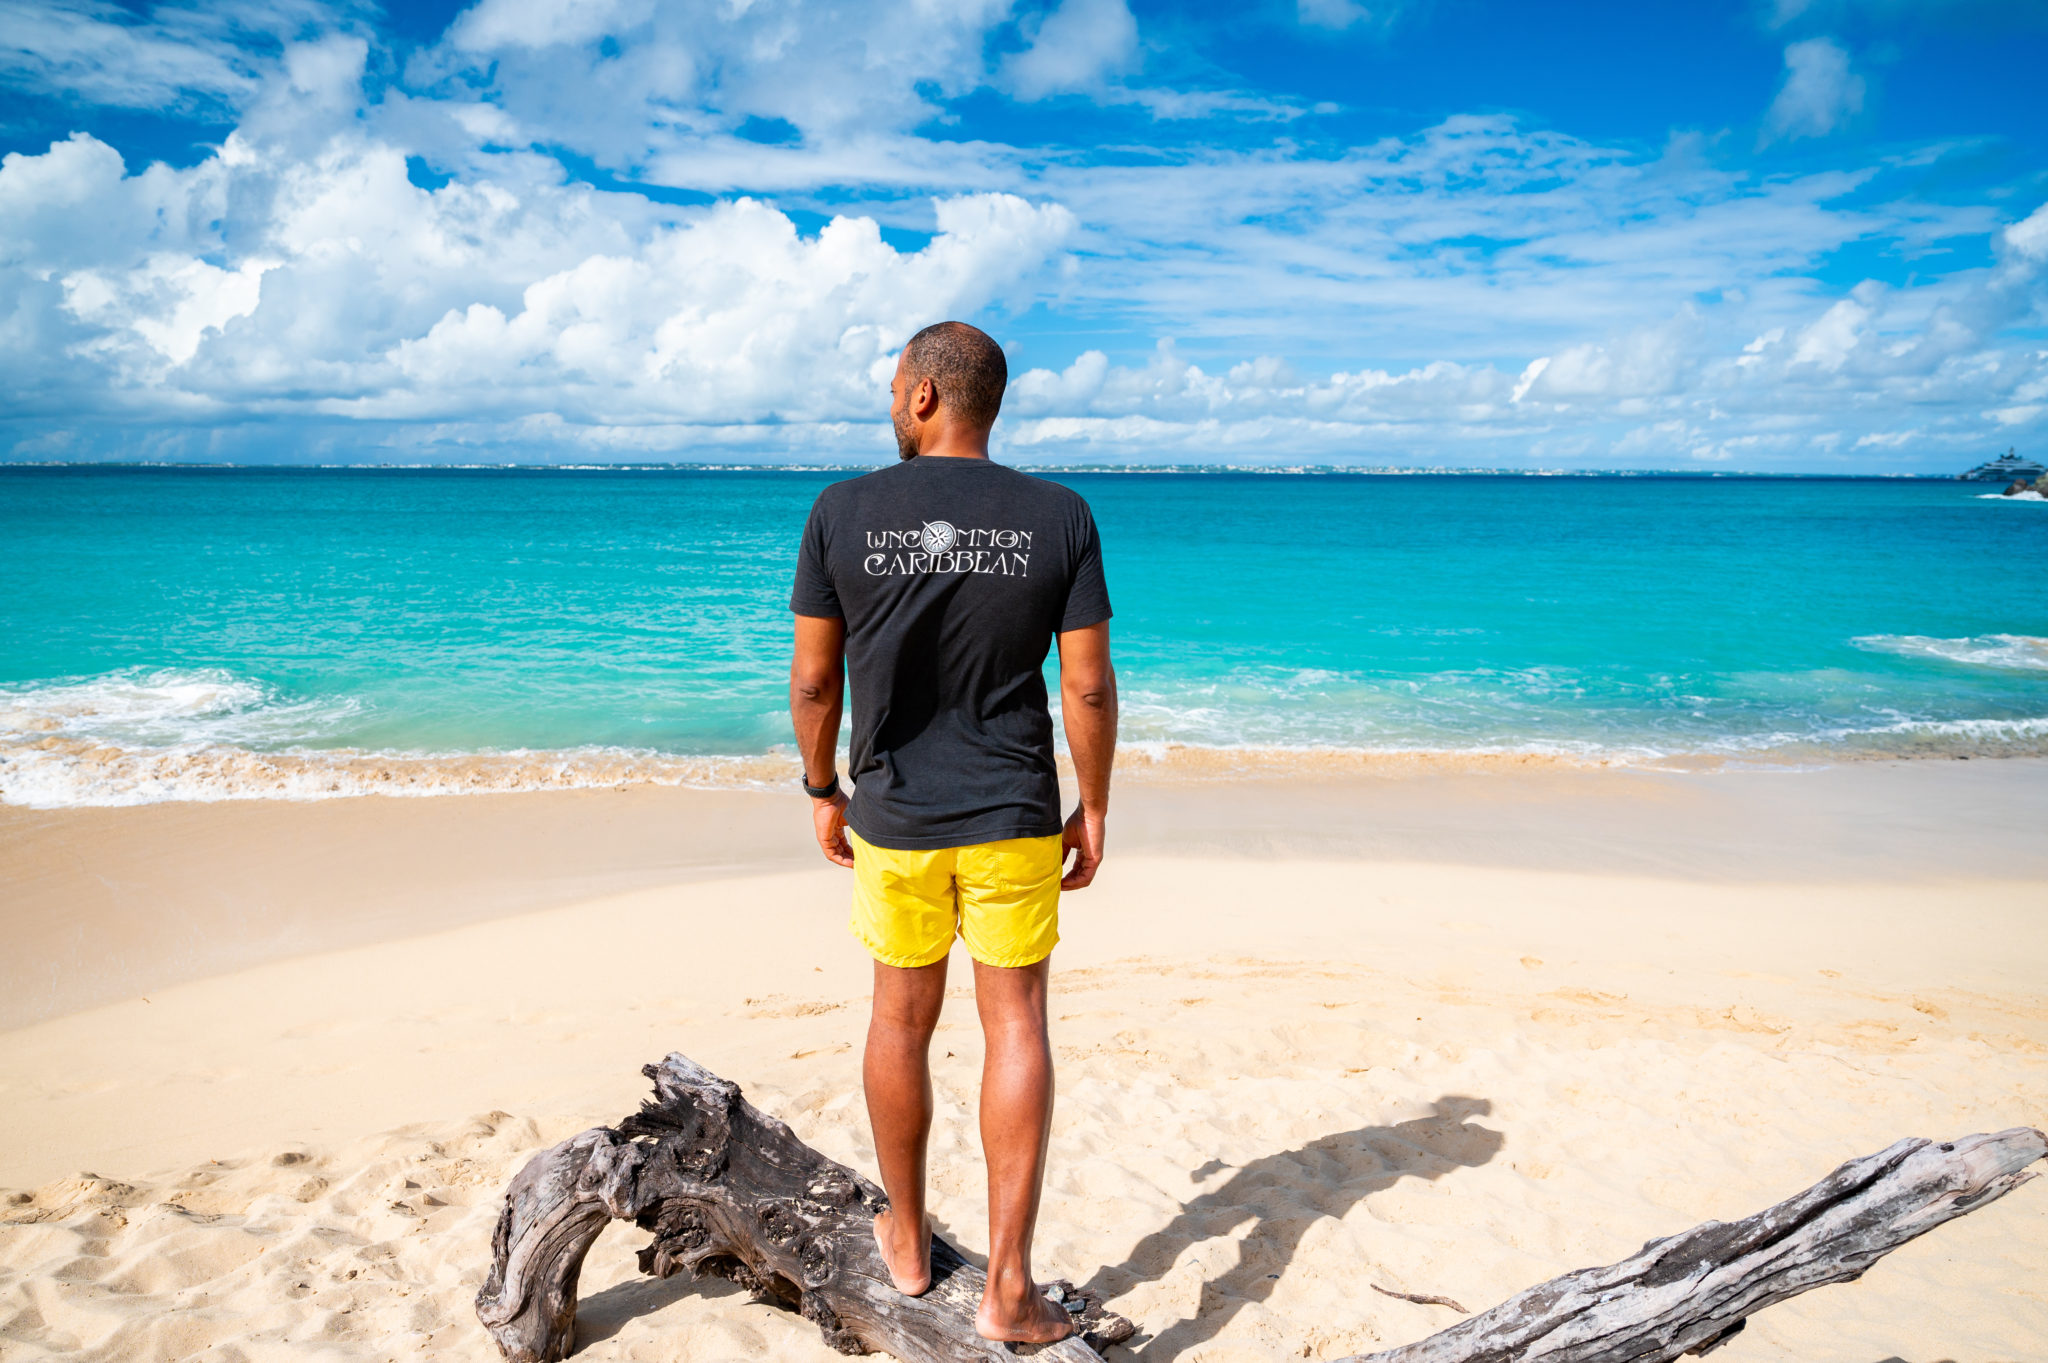 Happy Bay Beach St. Martin/St. Maarten